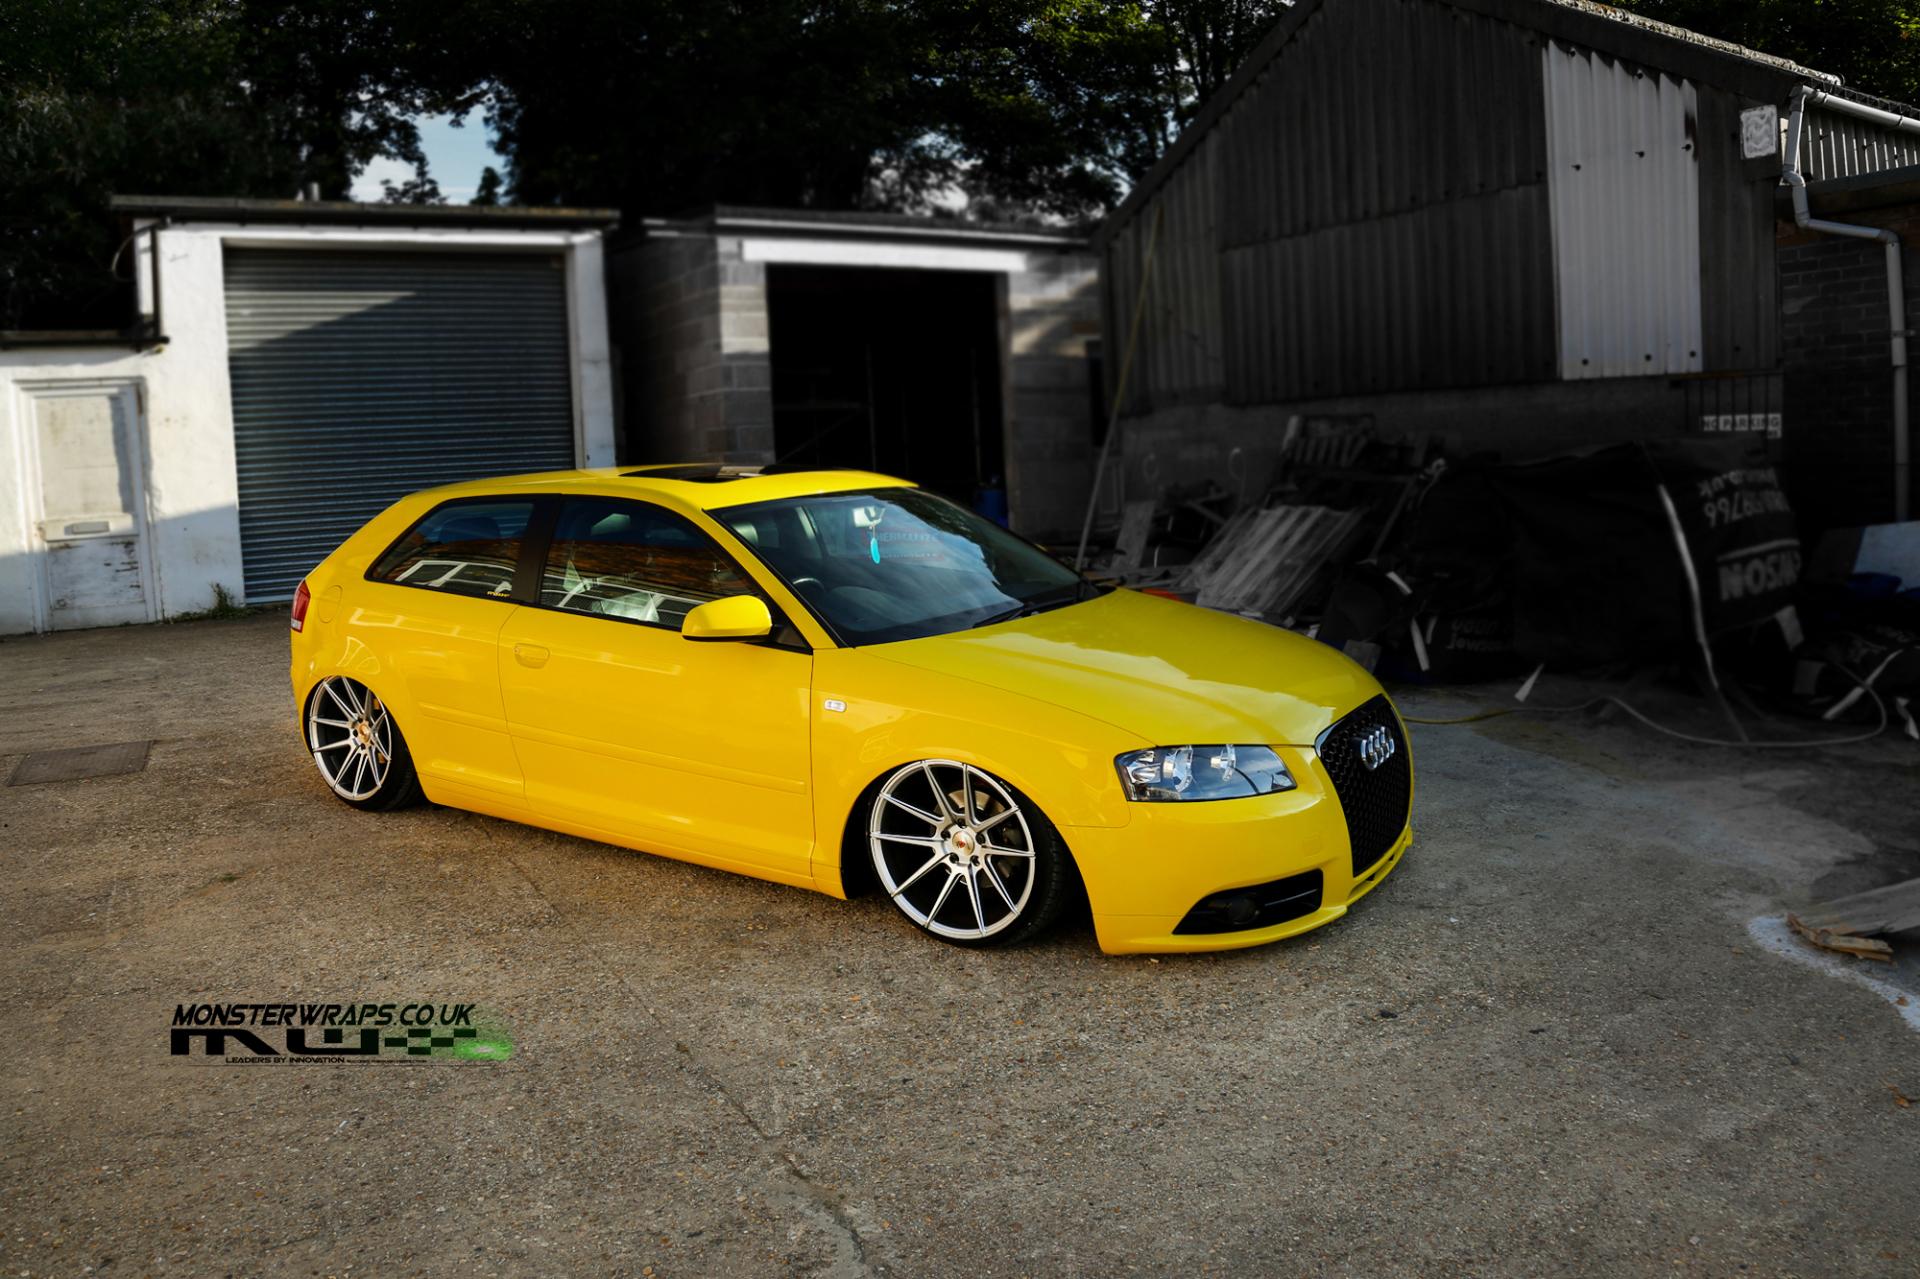 Audi A3 Gloss yellow wrap